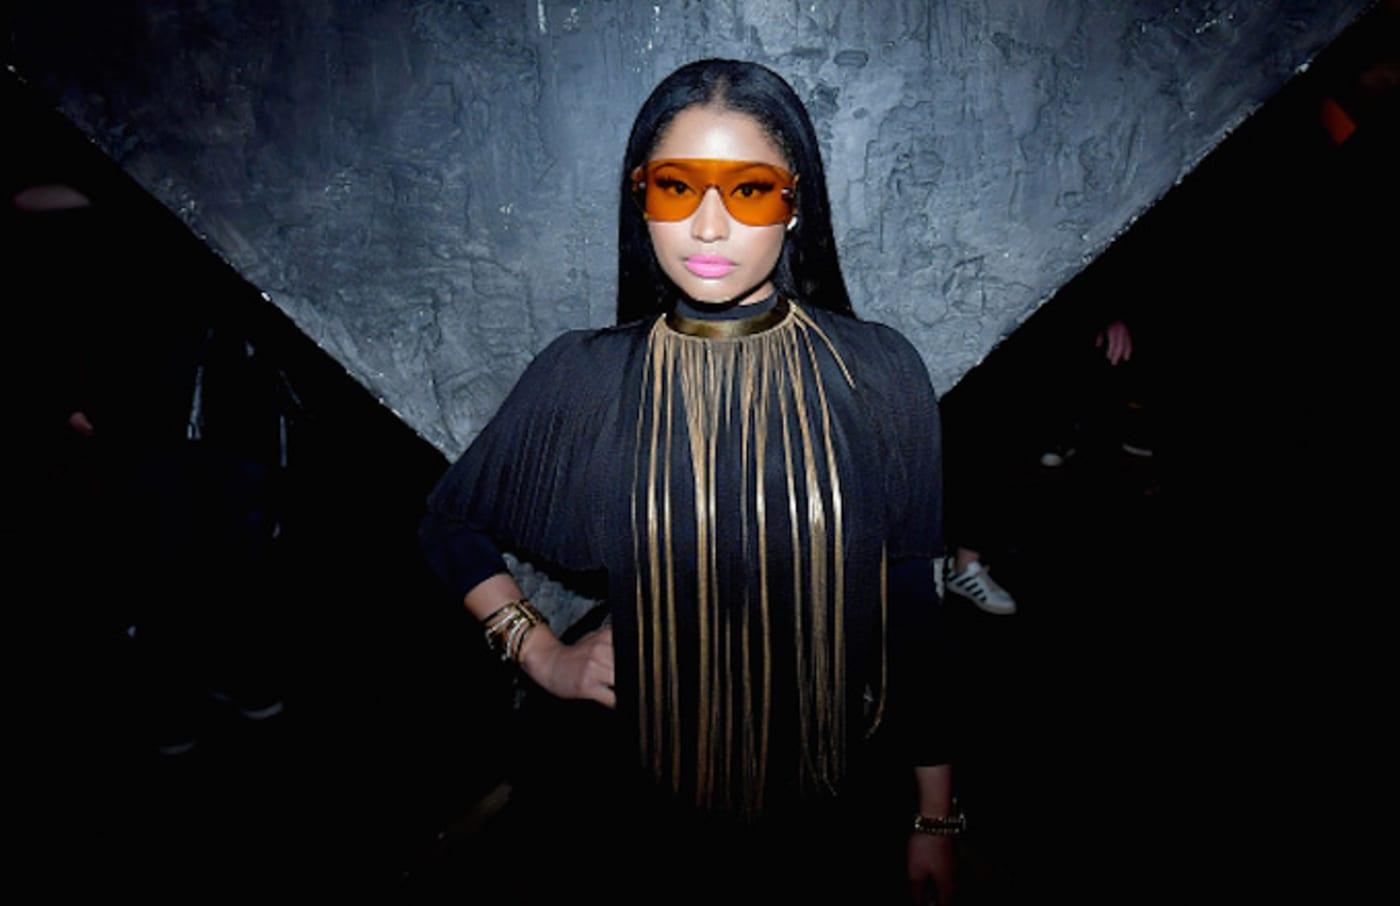 Nicki Minaj attends Balmain aftershow party as part of Paris Fashion Week